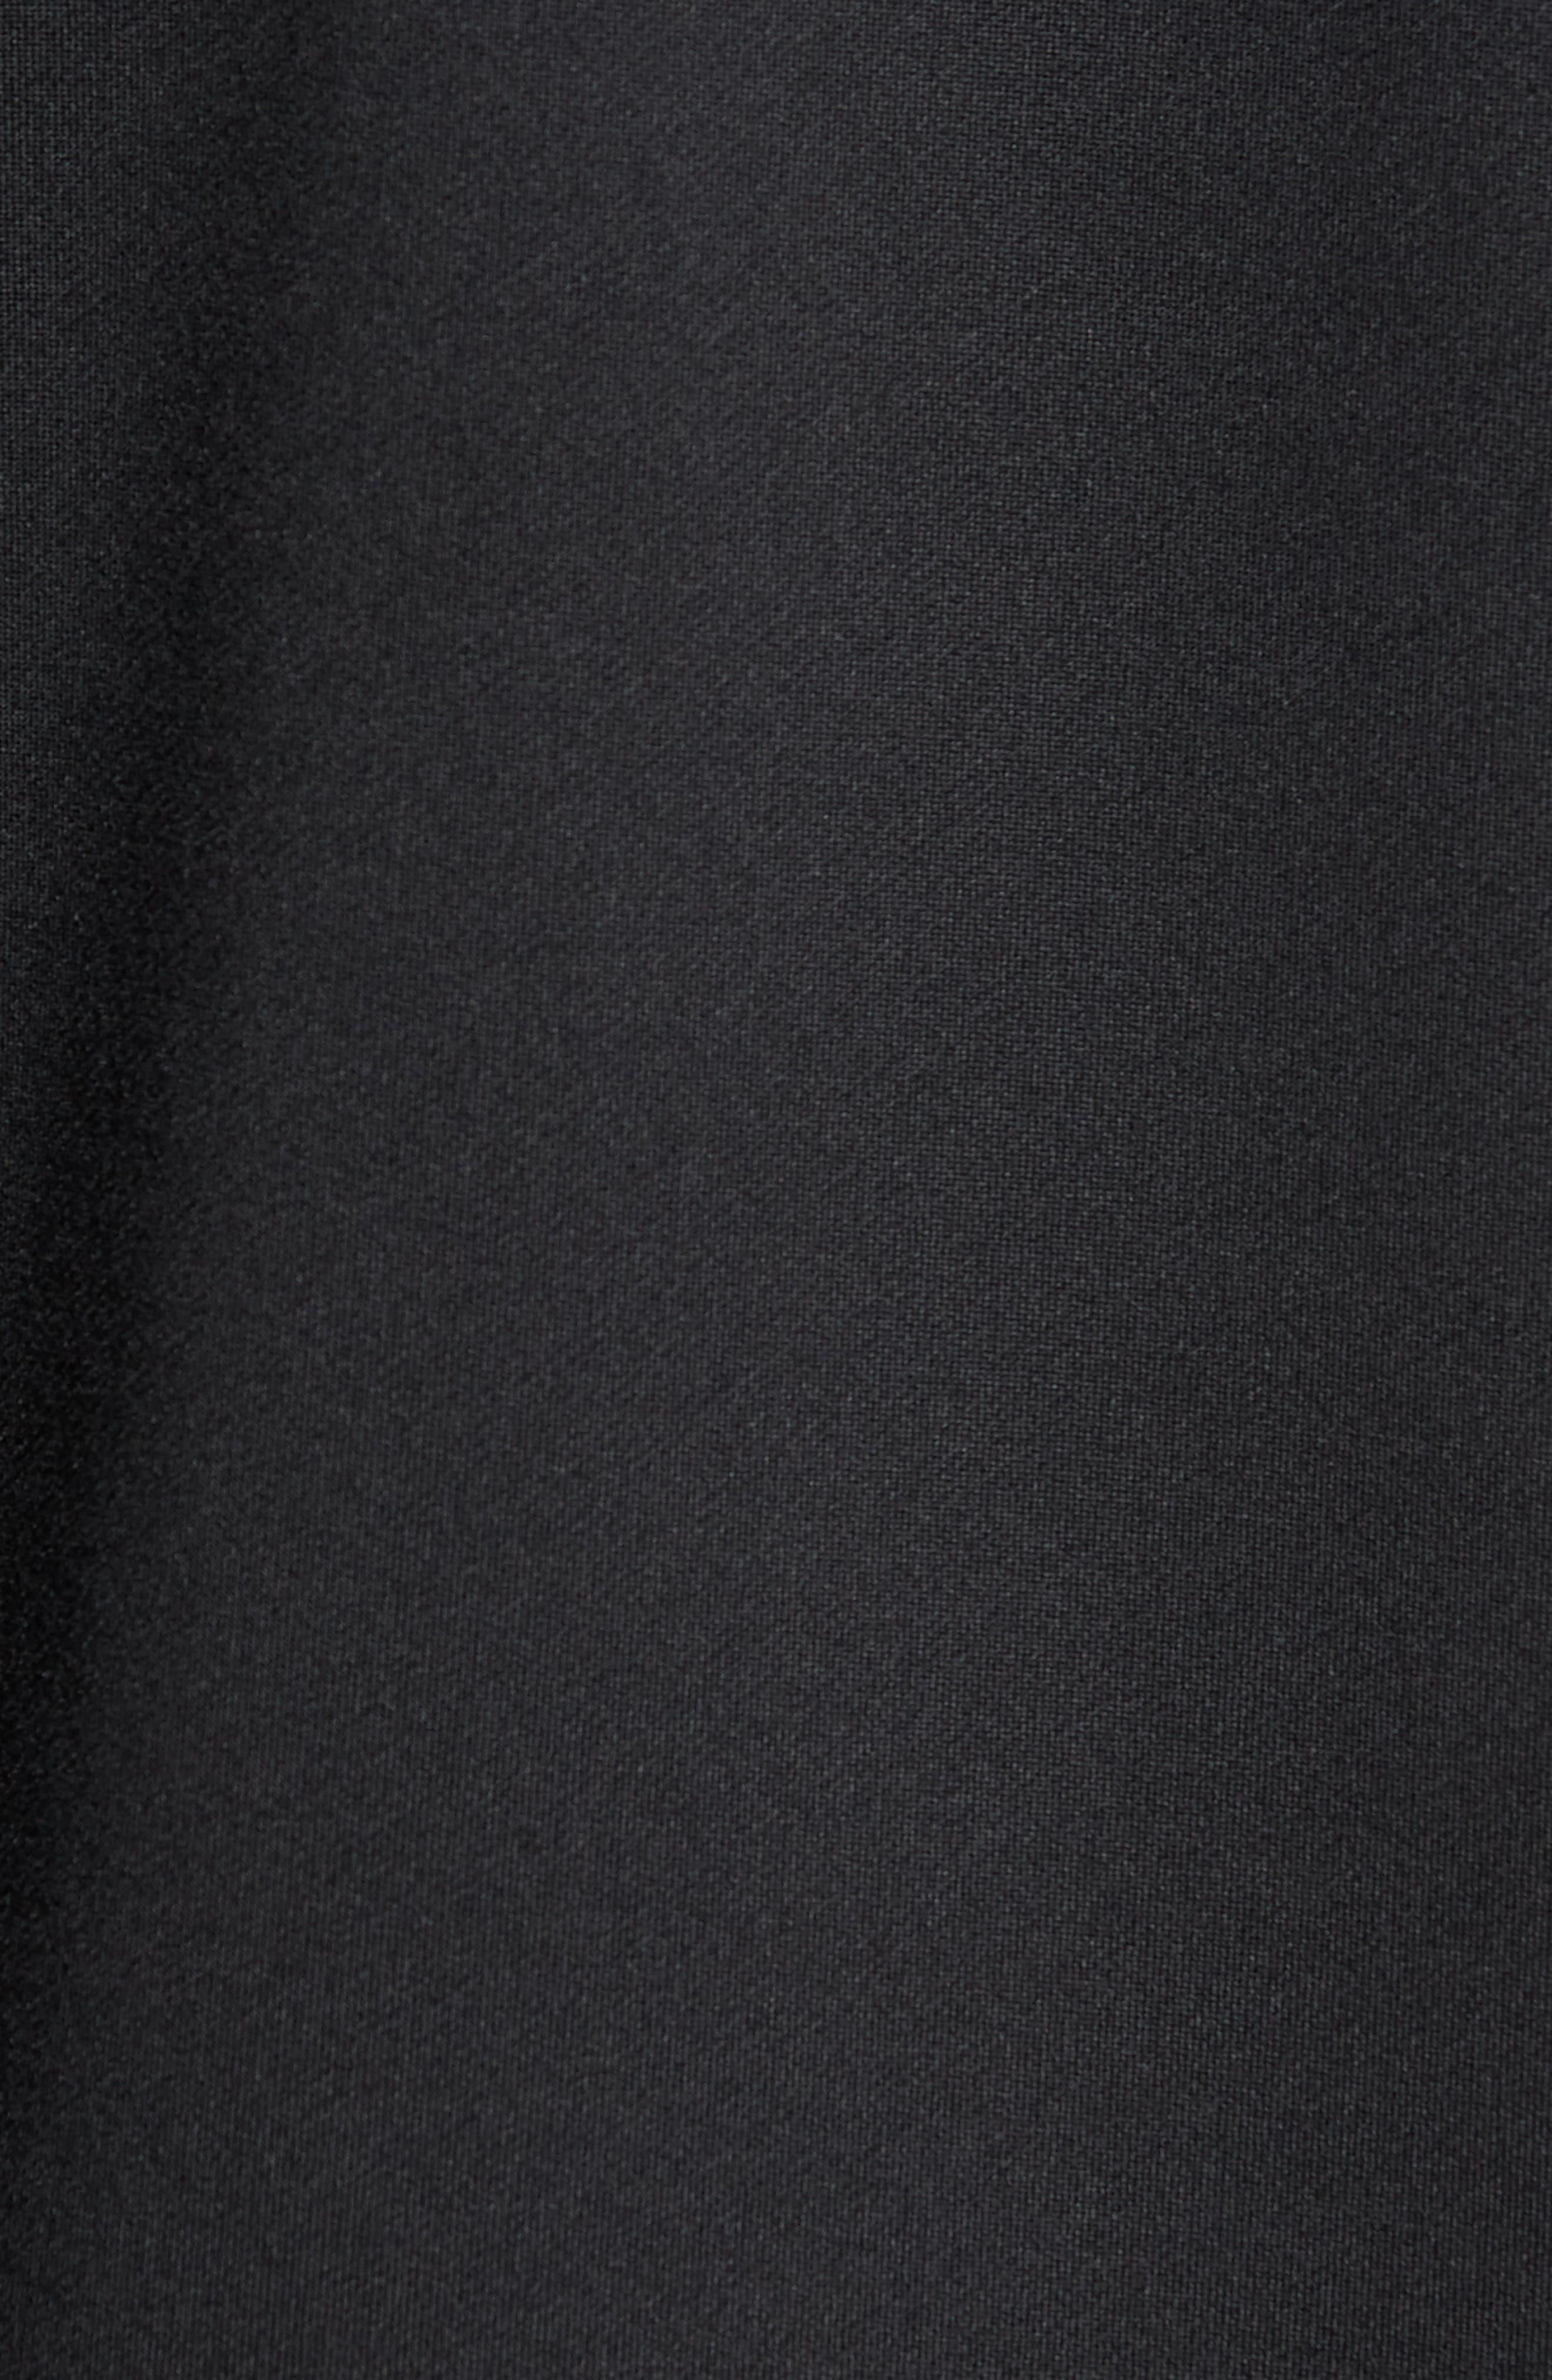 Hybrid Coolmax Crewneck Shirt,                             Alternate thumbnail 5, color,                             Black